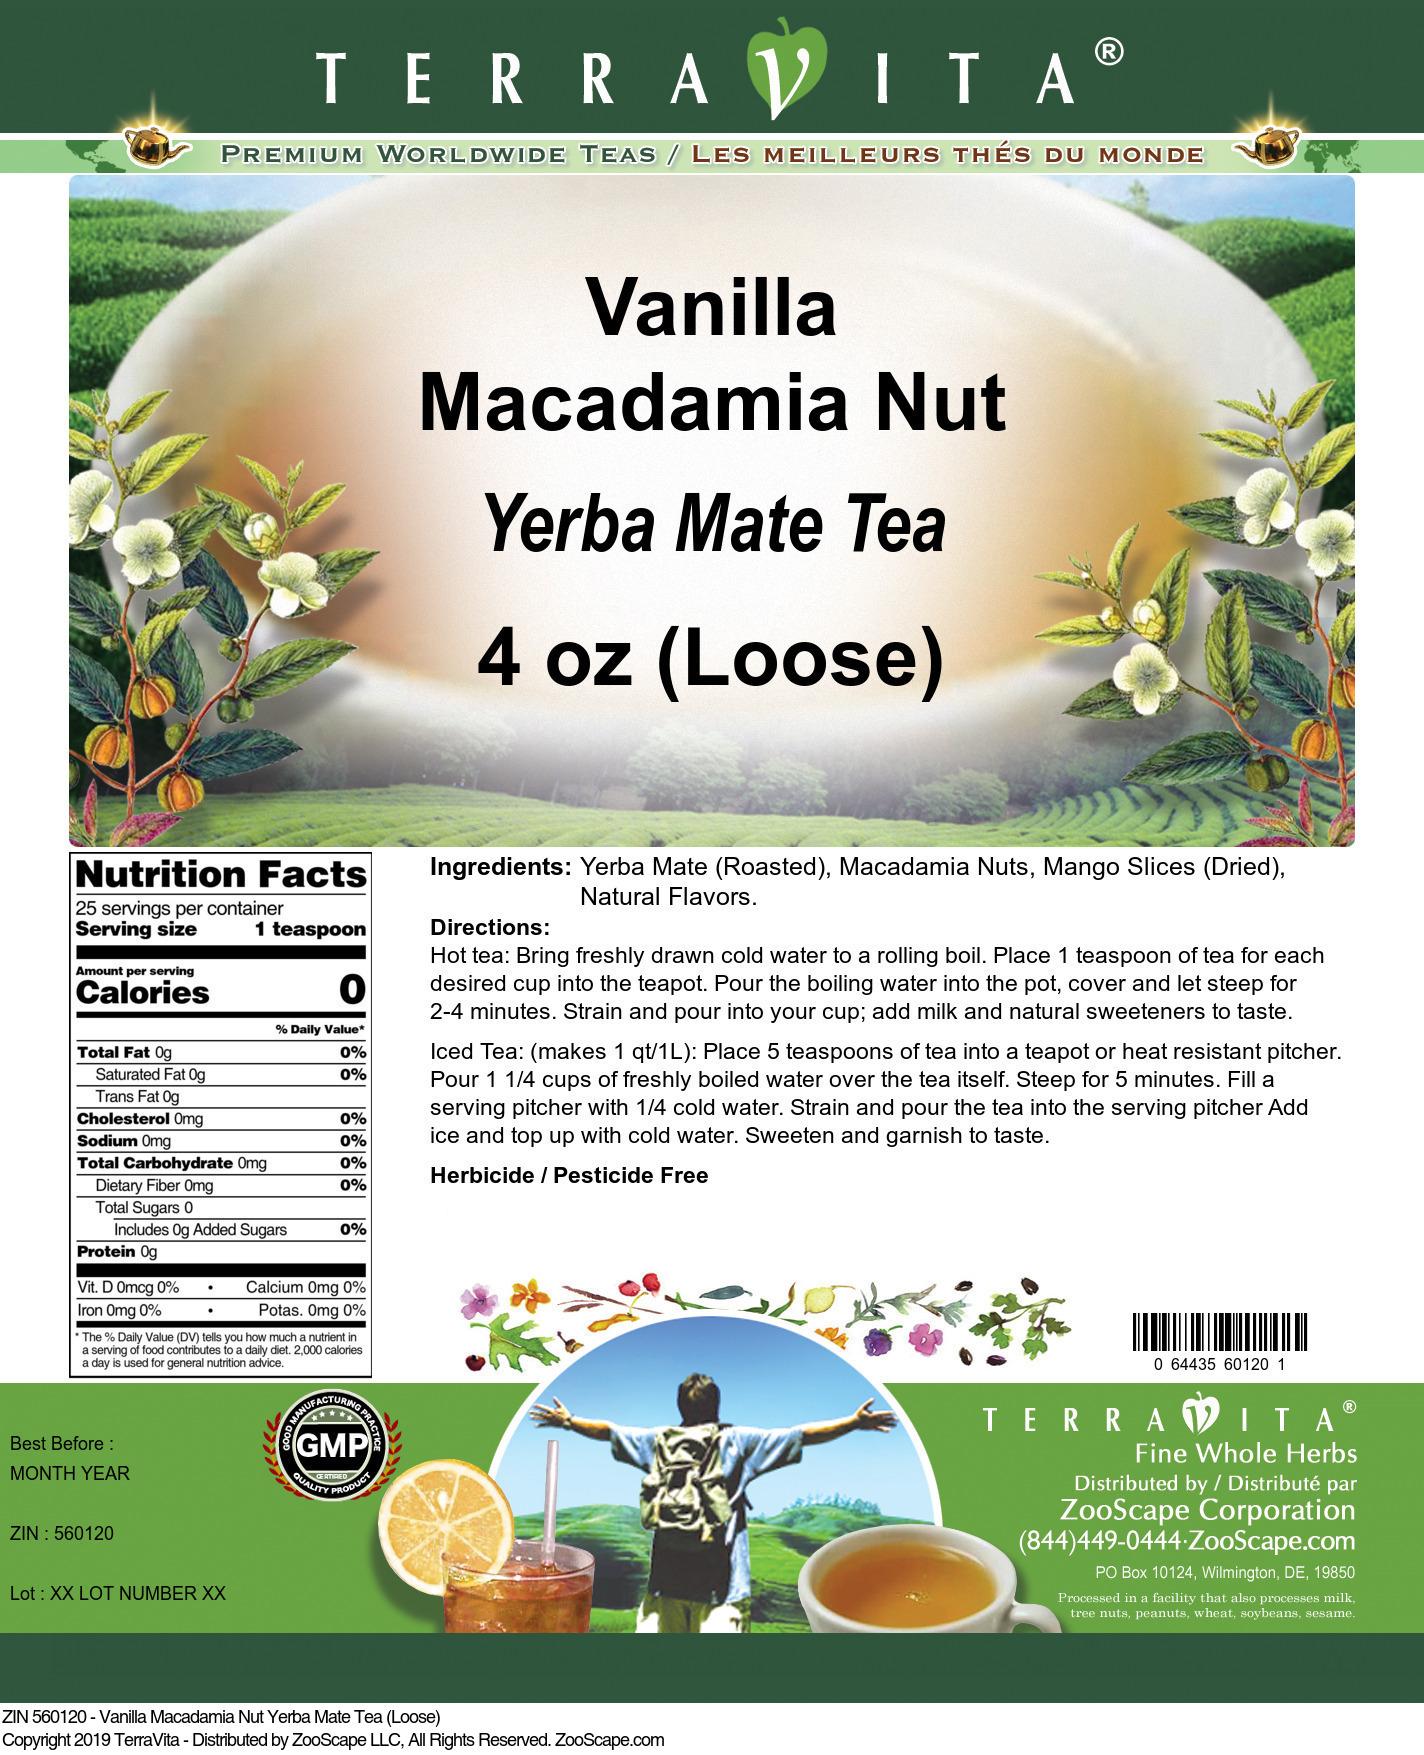 Vanilla Macadamia Nut Yerba Mate Tea (Loose)